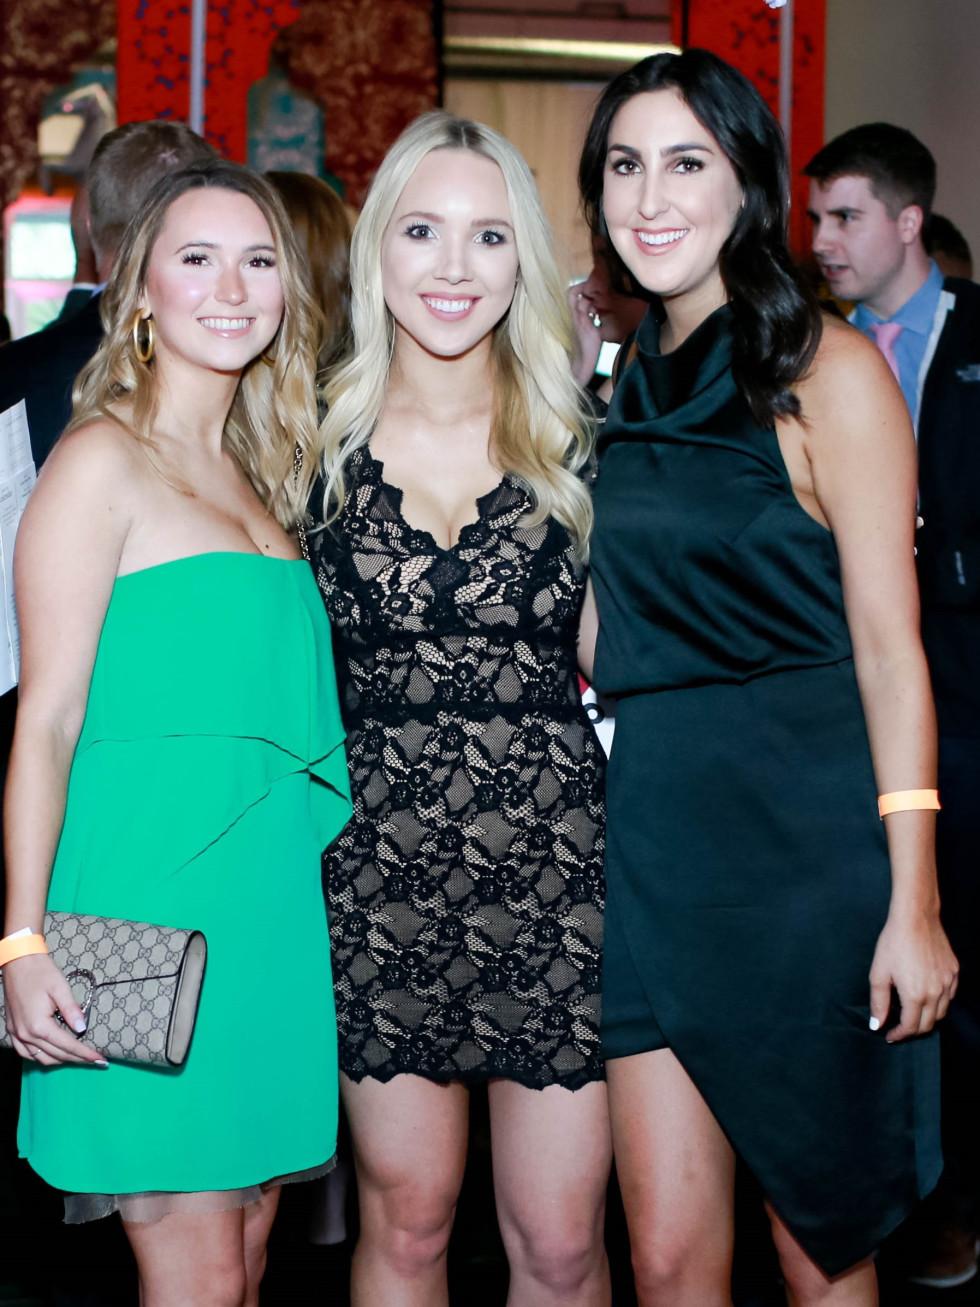 Mallory Plummer, Kimberly Cadarette and Taylor Wolf